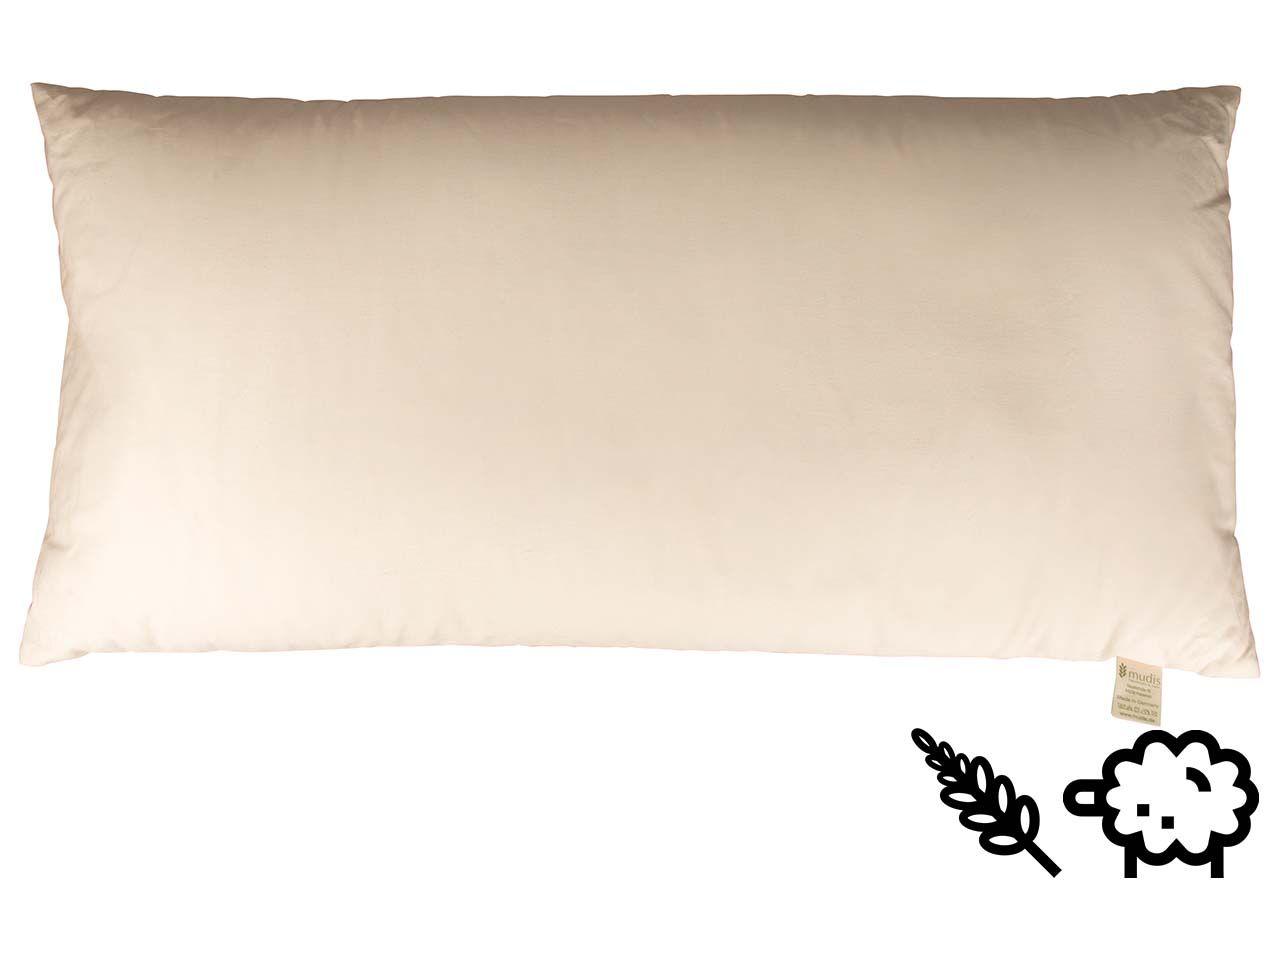 mudis Kopfkissen 40 x 80 cm Hirseschalen/Schafschurwolle 10480-00